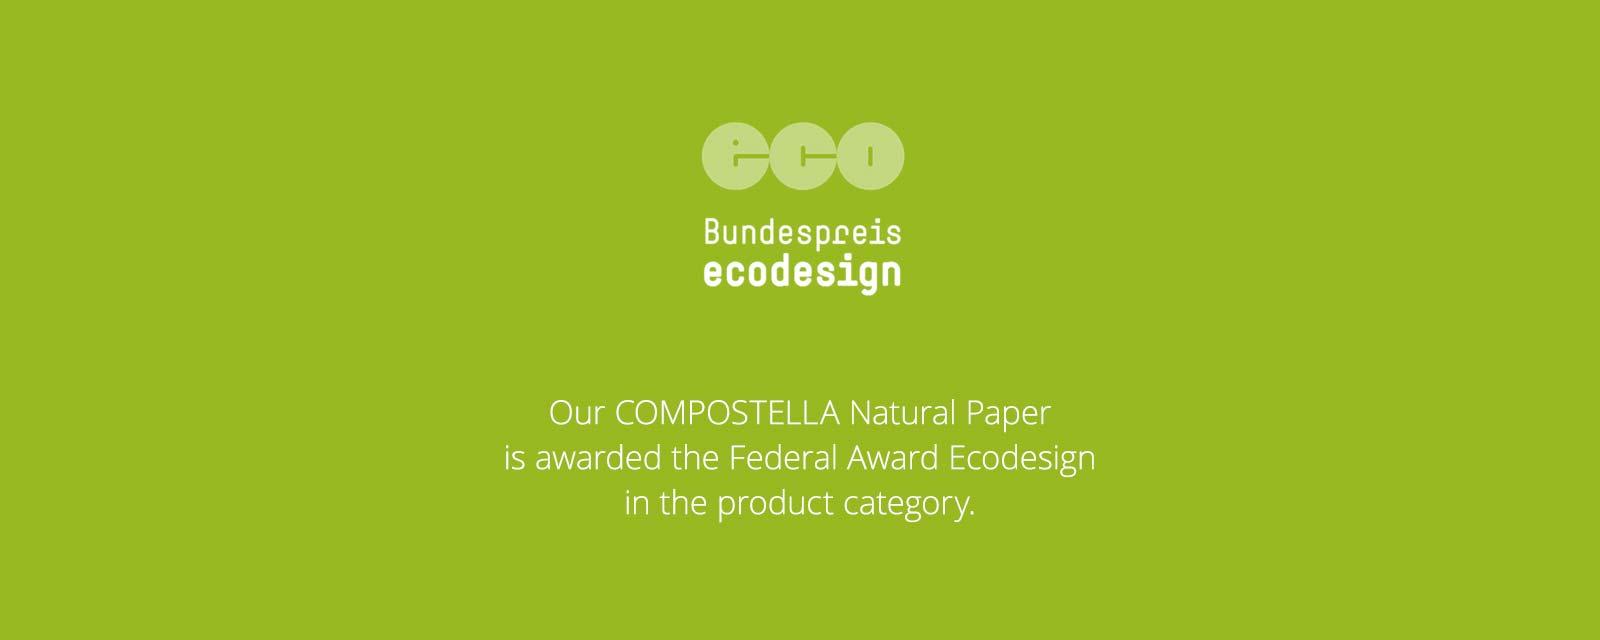 Compostella Federal Award Ecodesign 2018